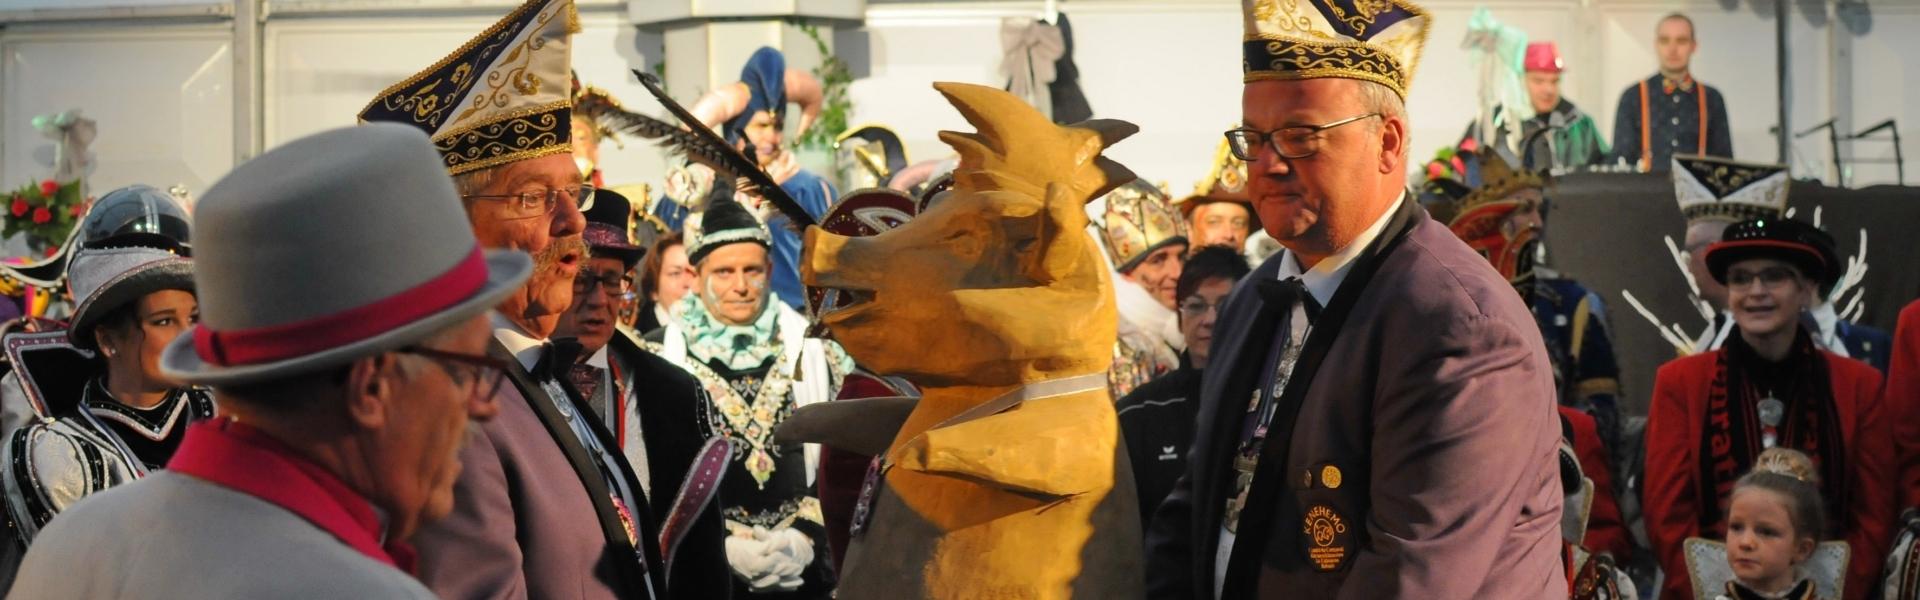 Küsch in Kelmis Karnevalsabend